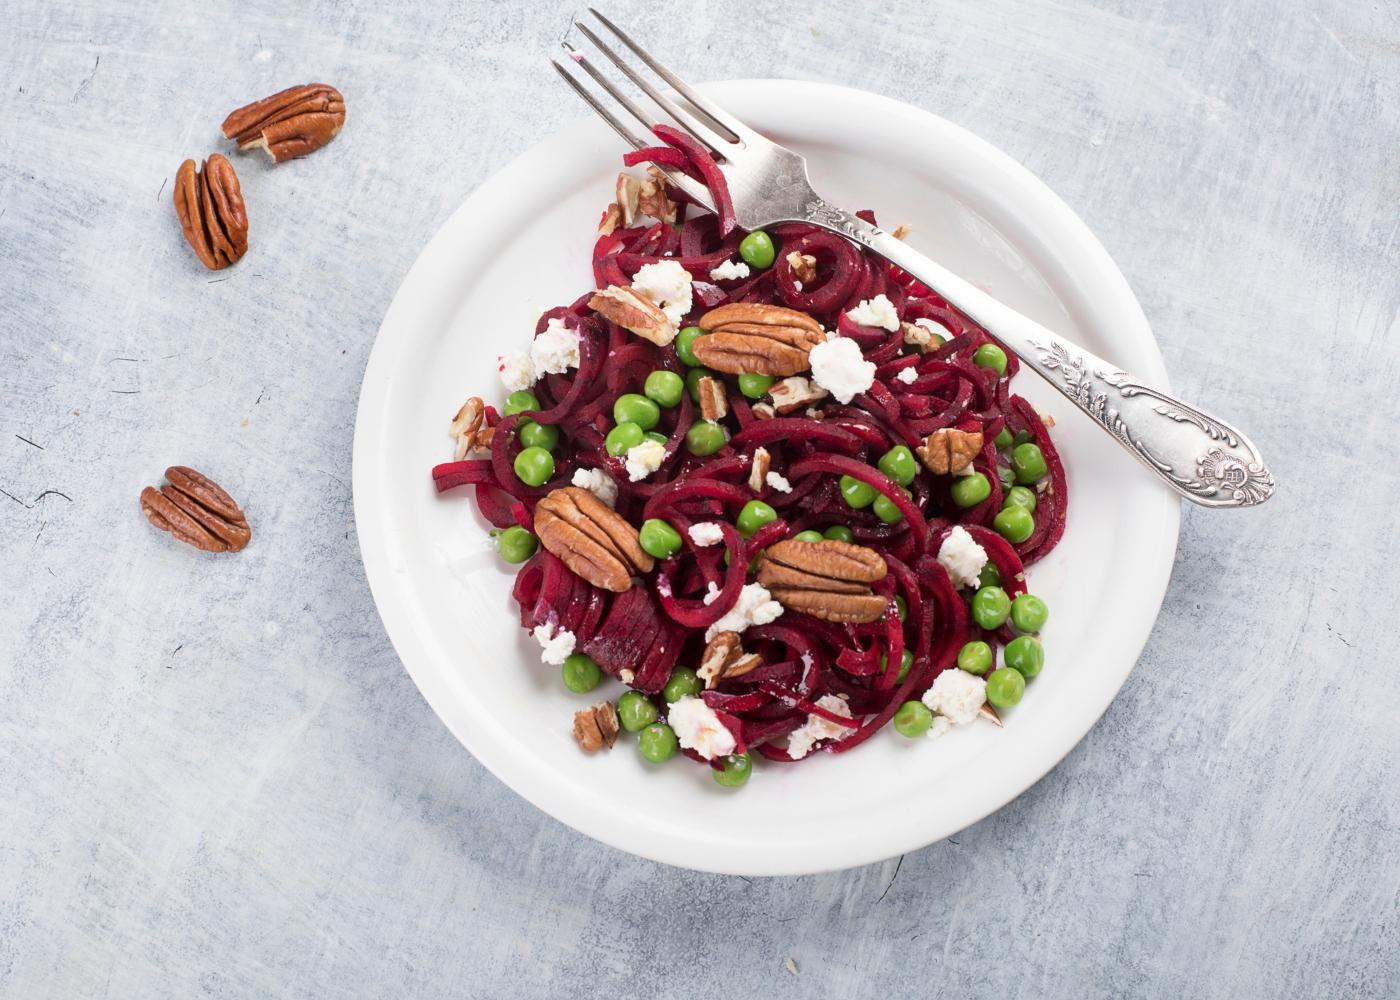 salada com beterraba num prato branco